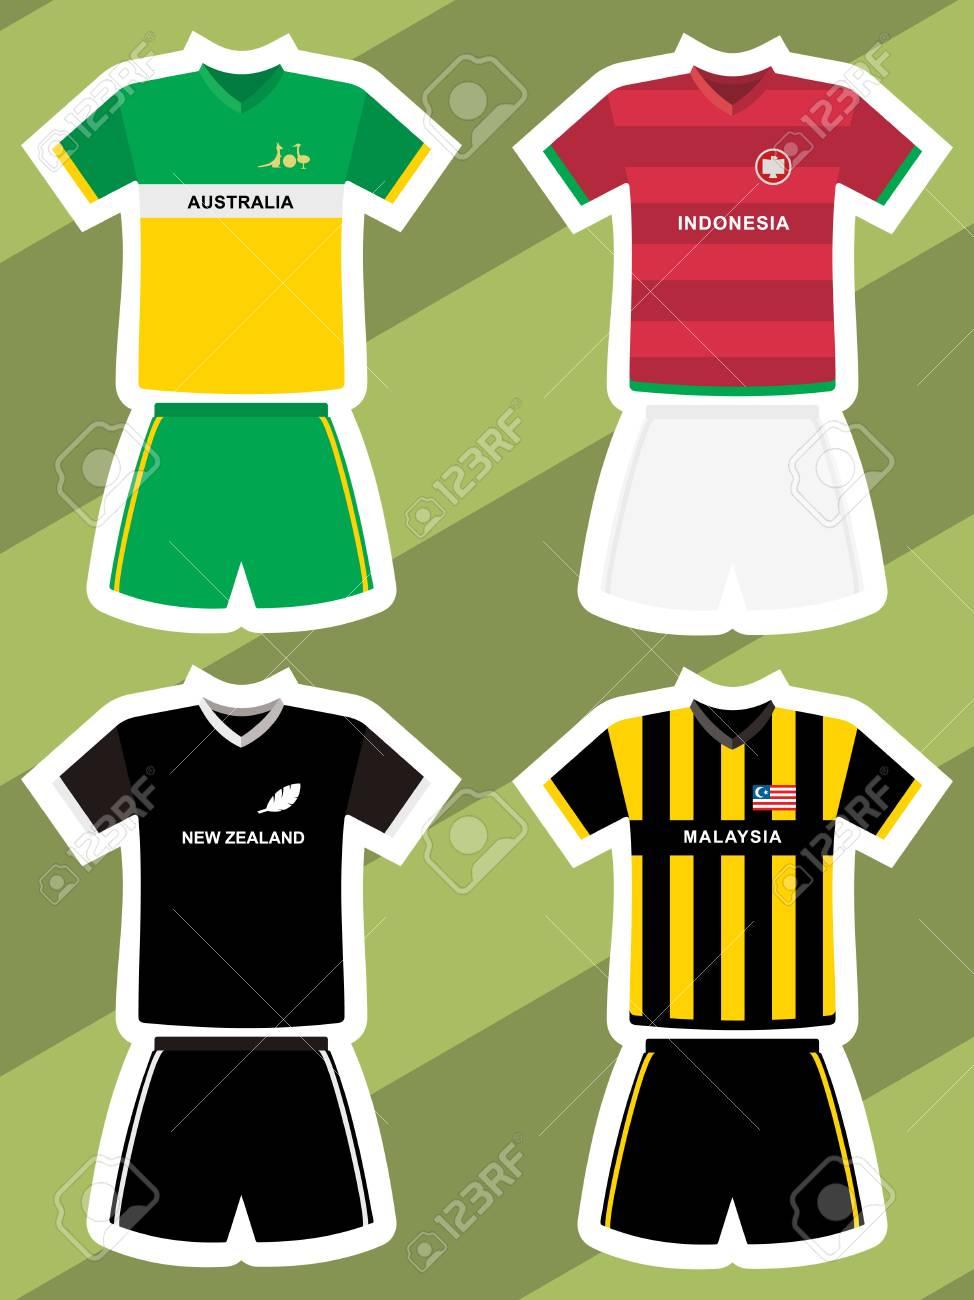 2a63b702423 set of abstract football jerseys, australia, new zealand, indonesia and  malaysia Stock Vector